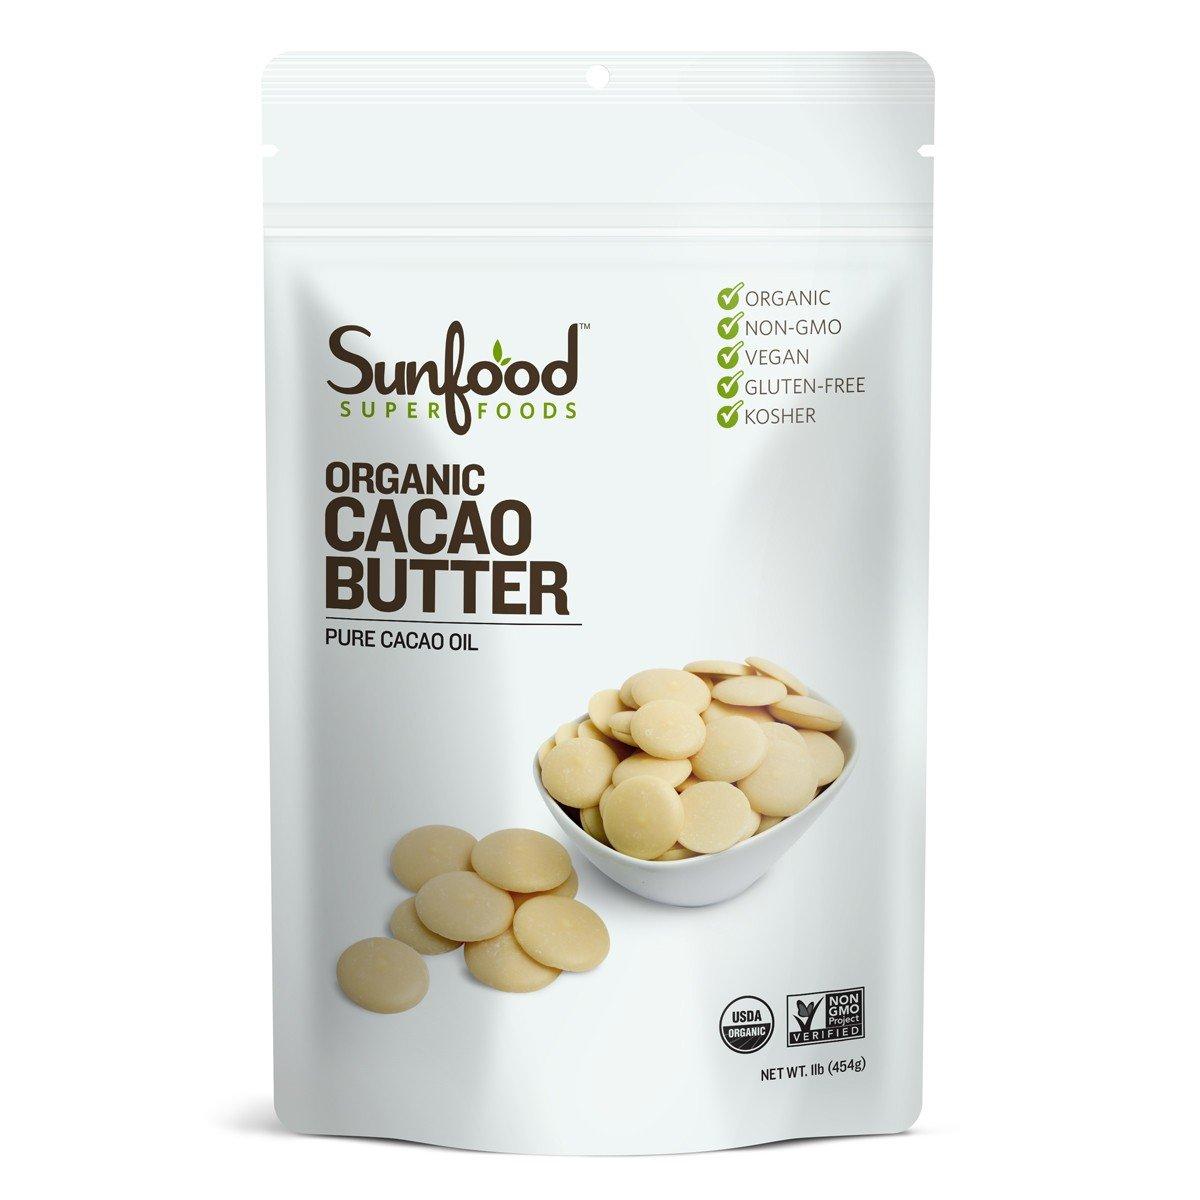 Sunfood Cacao Butter, 1lb, Organic